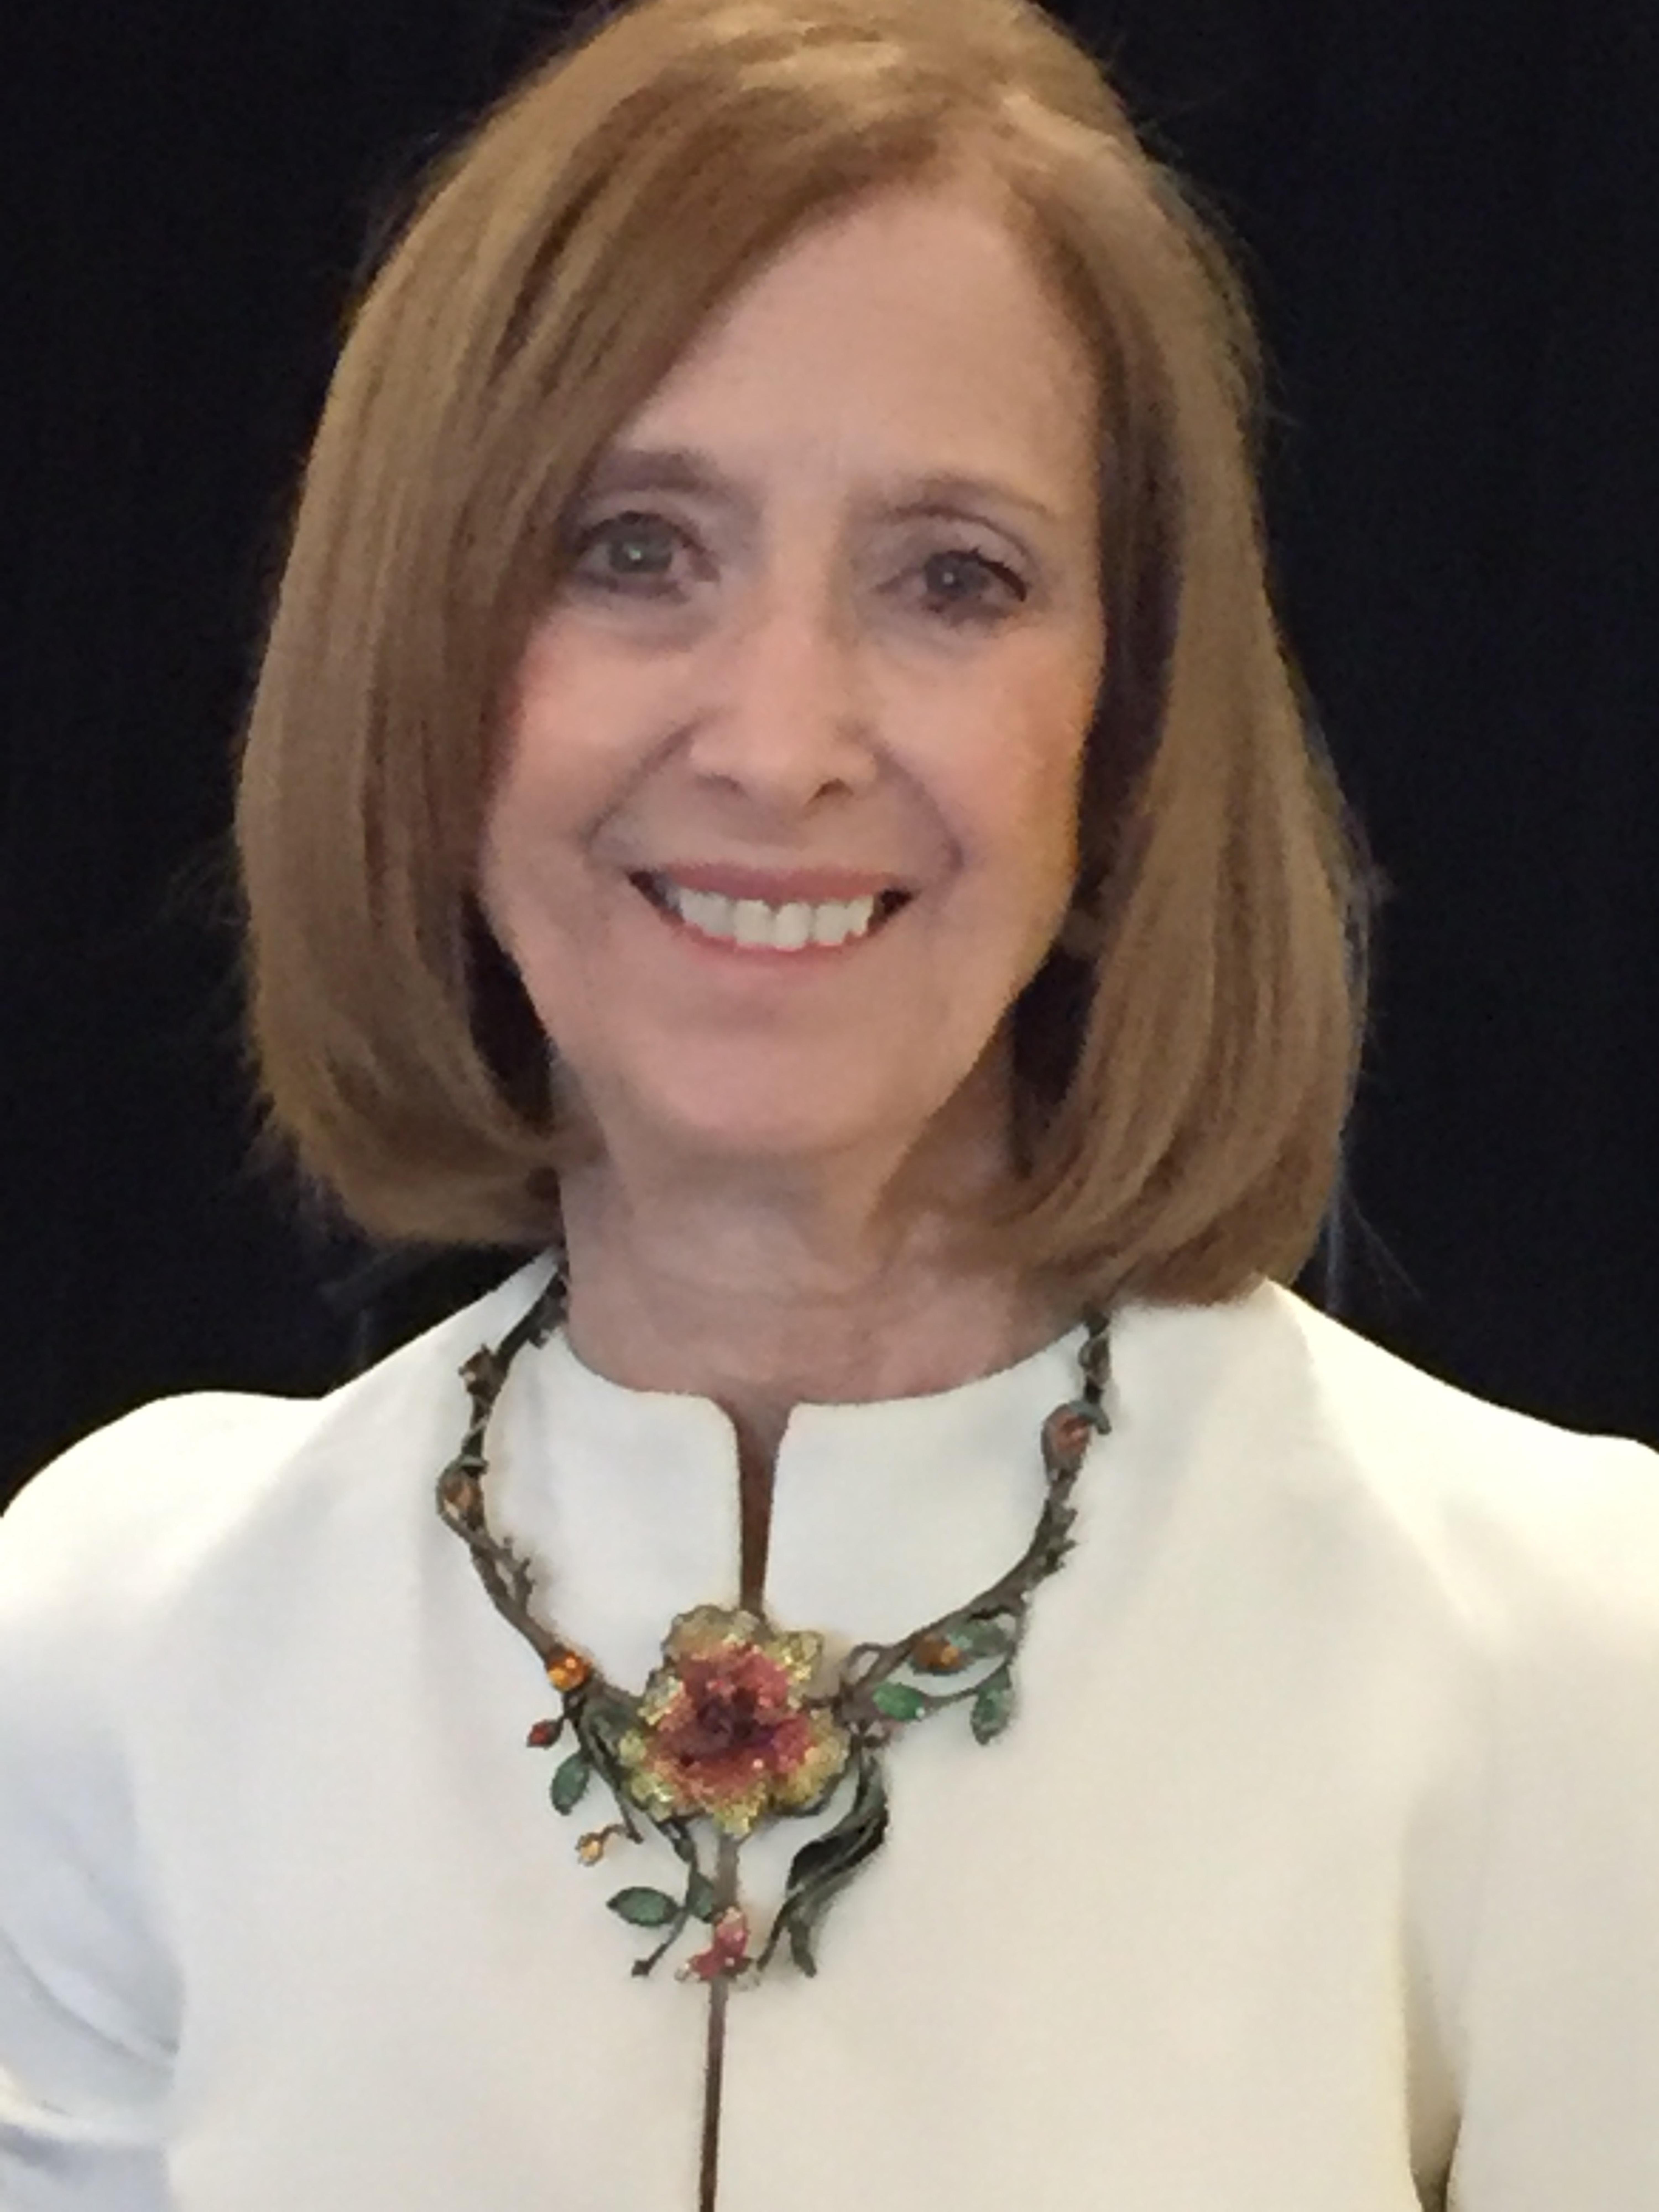 Debi Hoffman, community leader and philanthropist